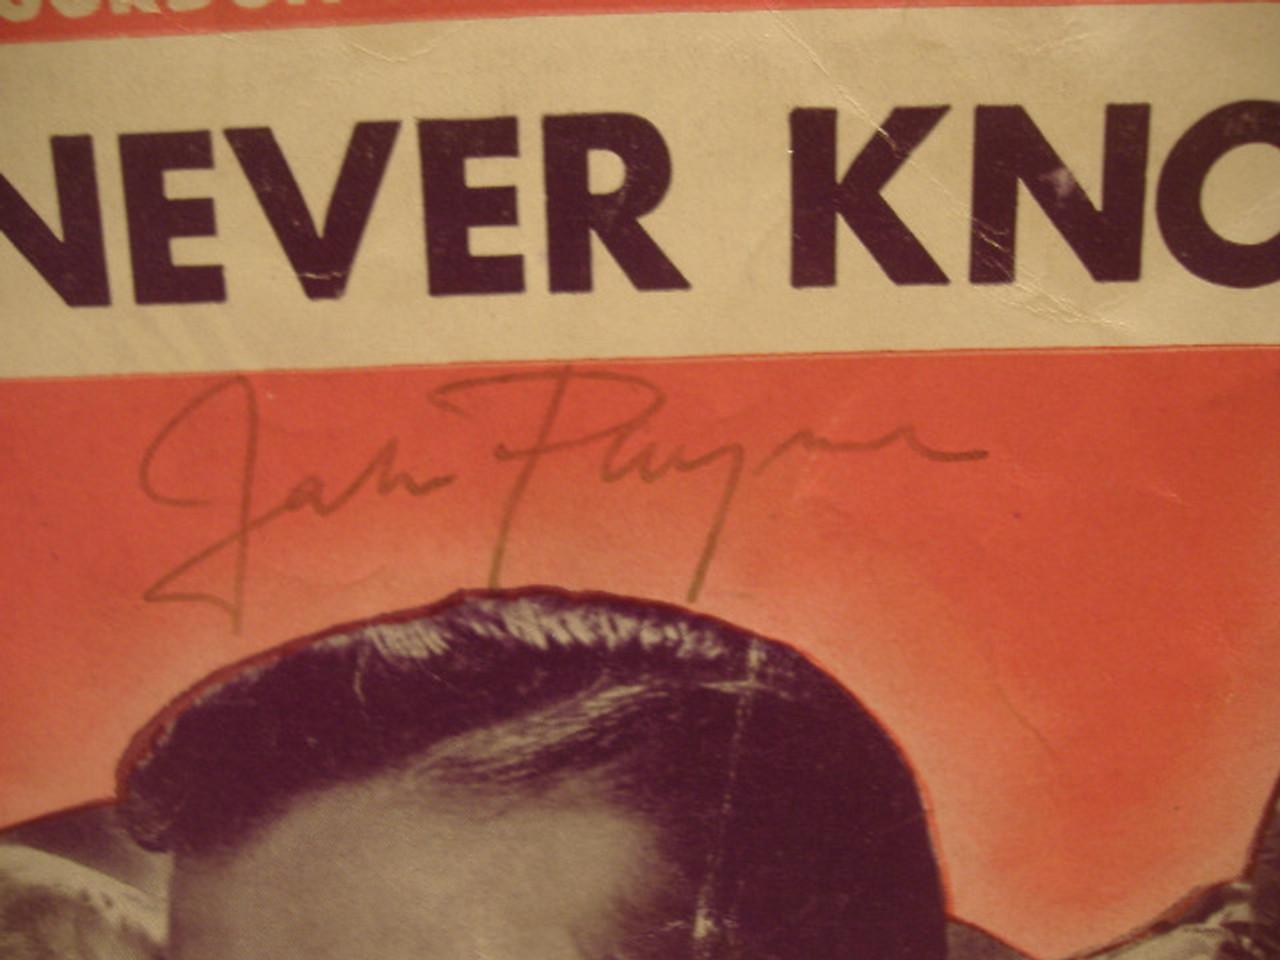 Payne, John Alice Faye Sheet Music Signed Autograph Hello Frisco Hello 1943